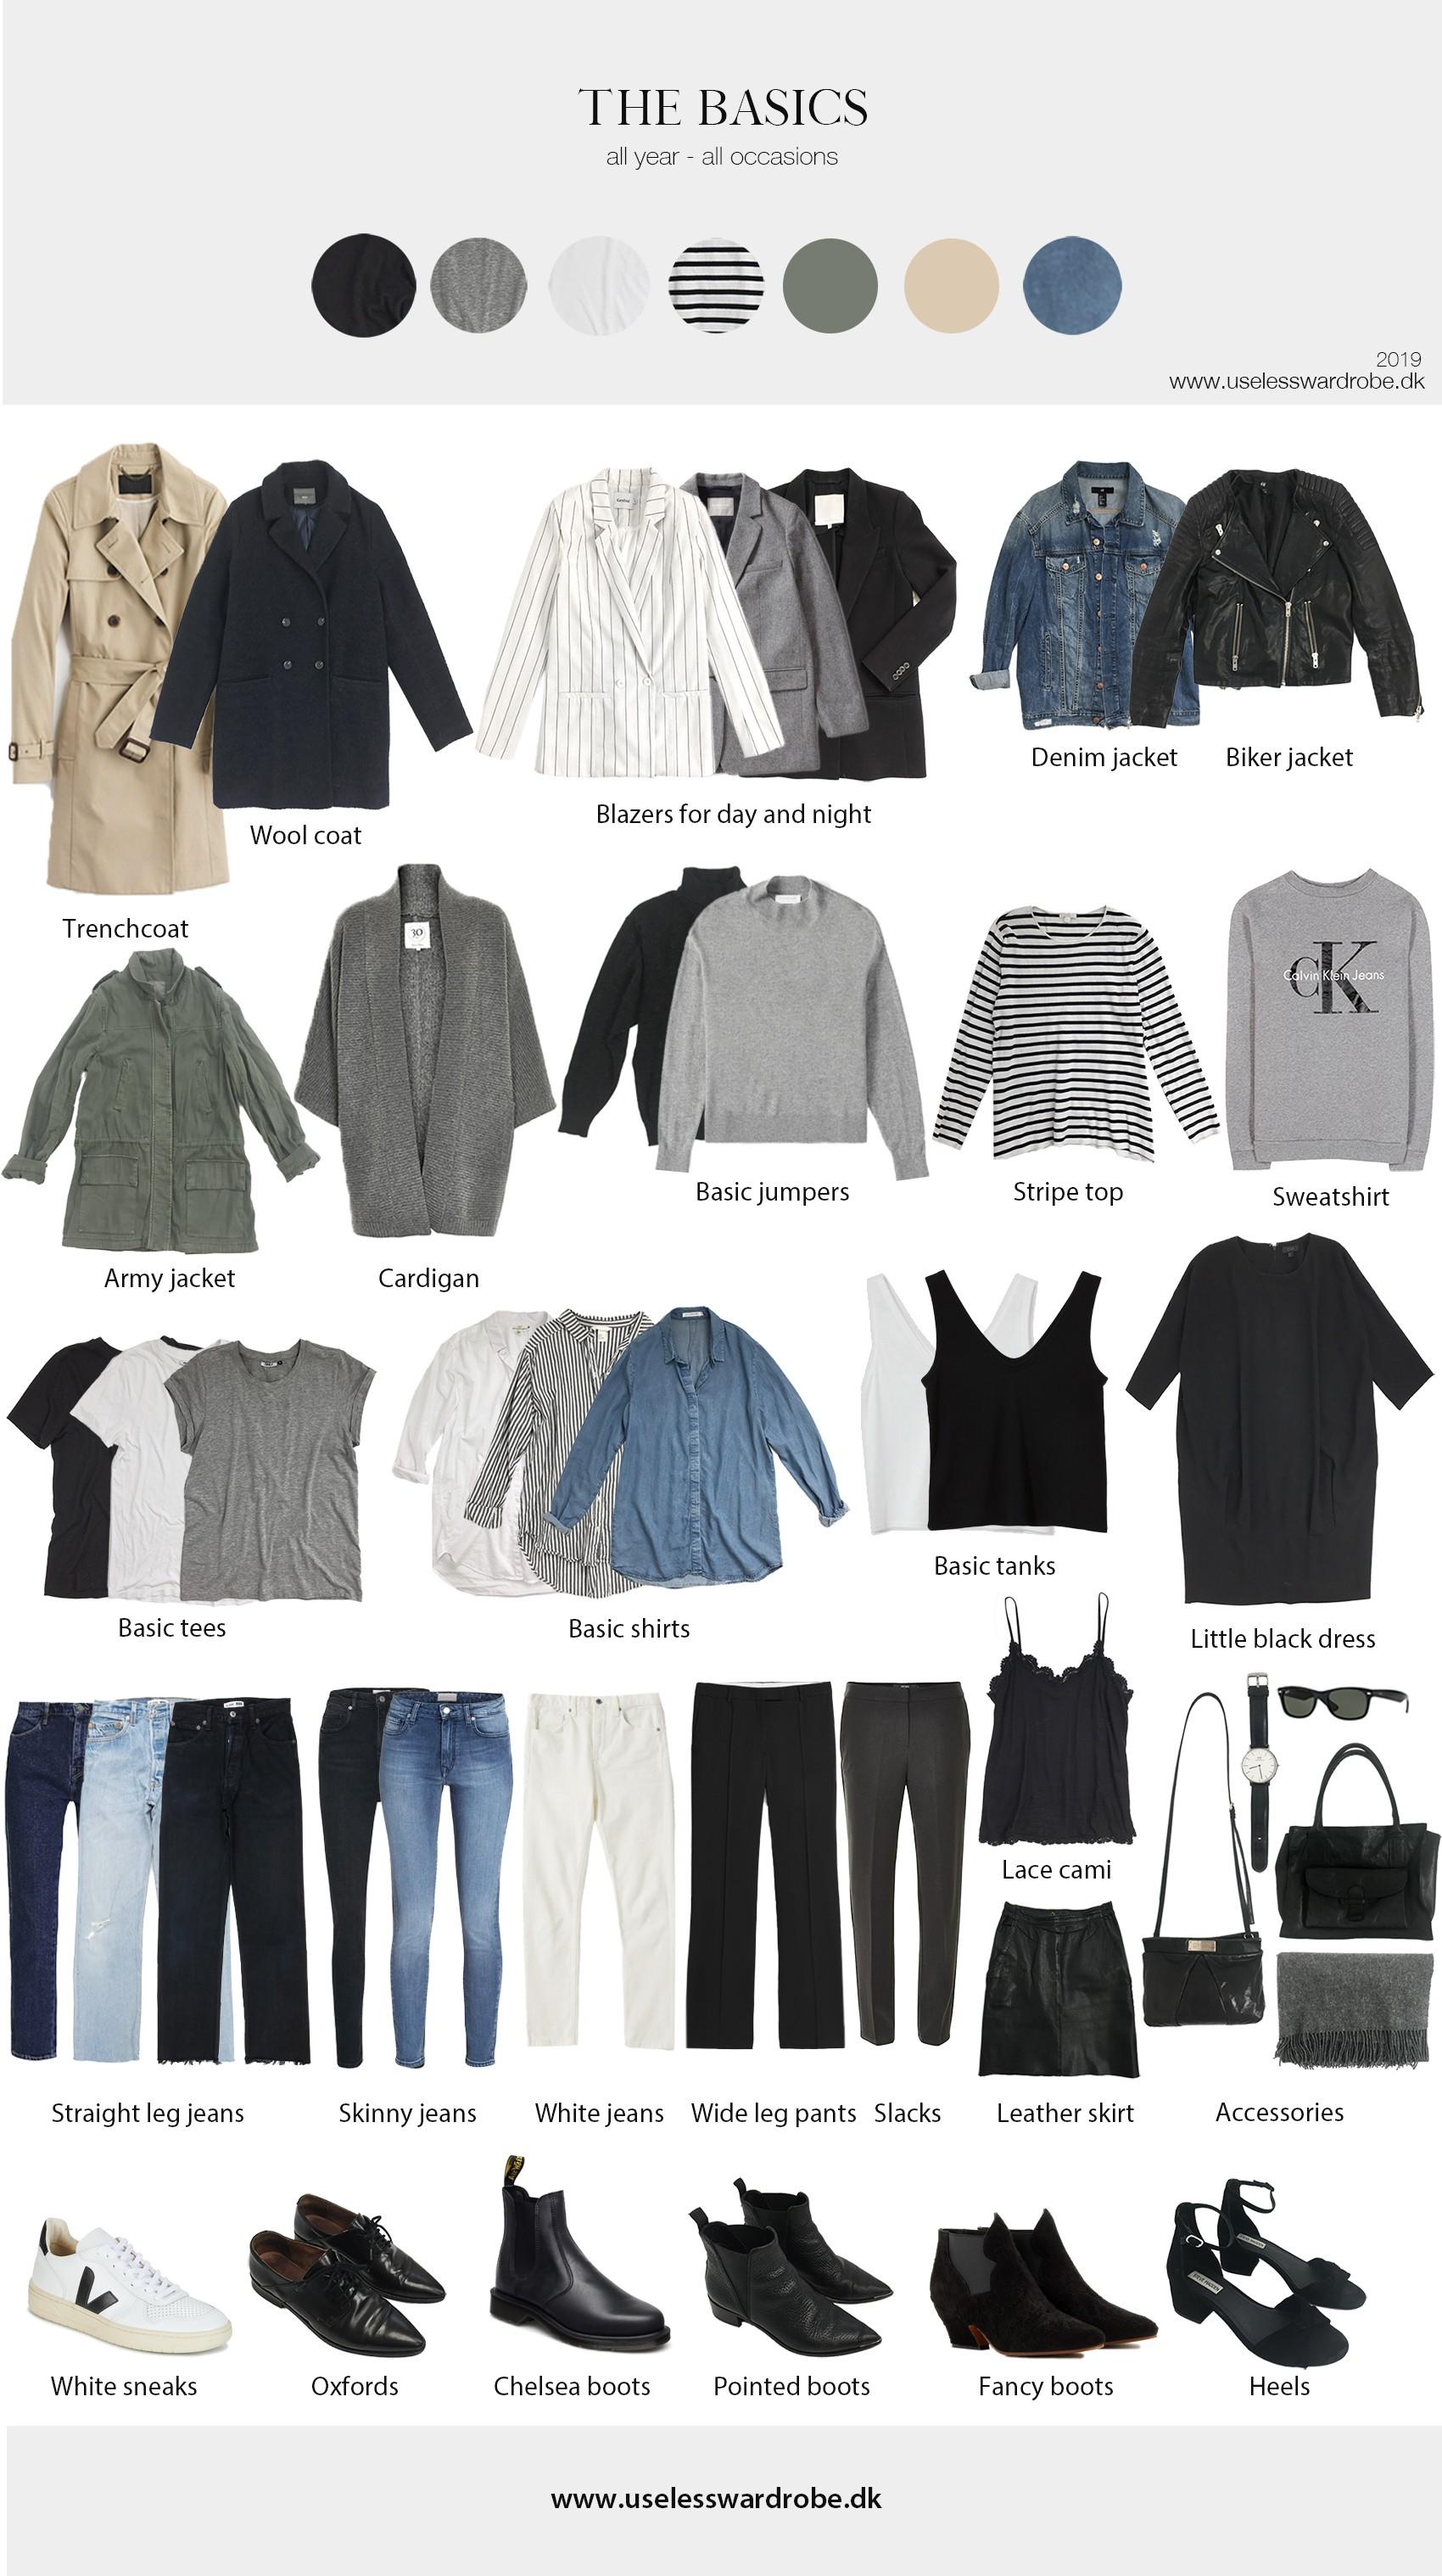 c4a72ff07f79 Capsule wardrobe: what, why & how